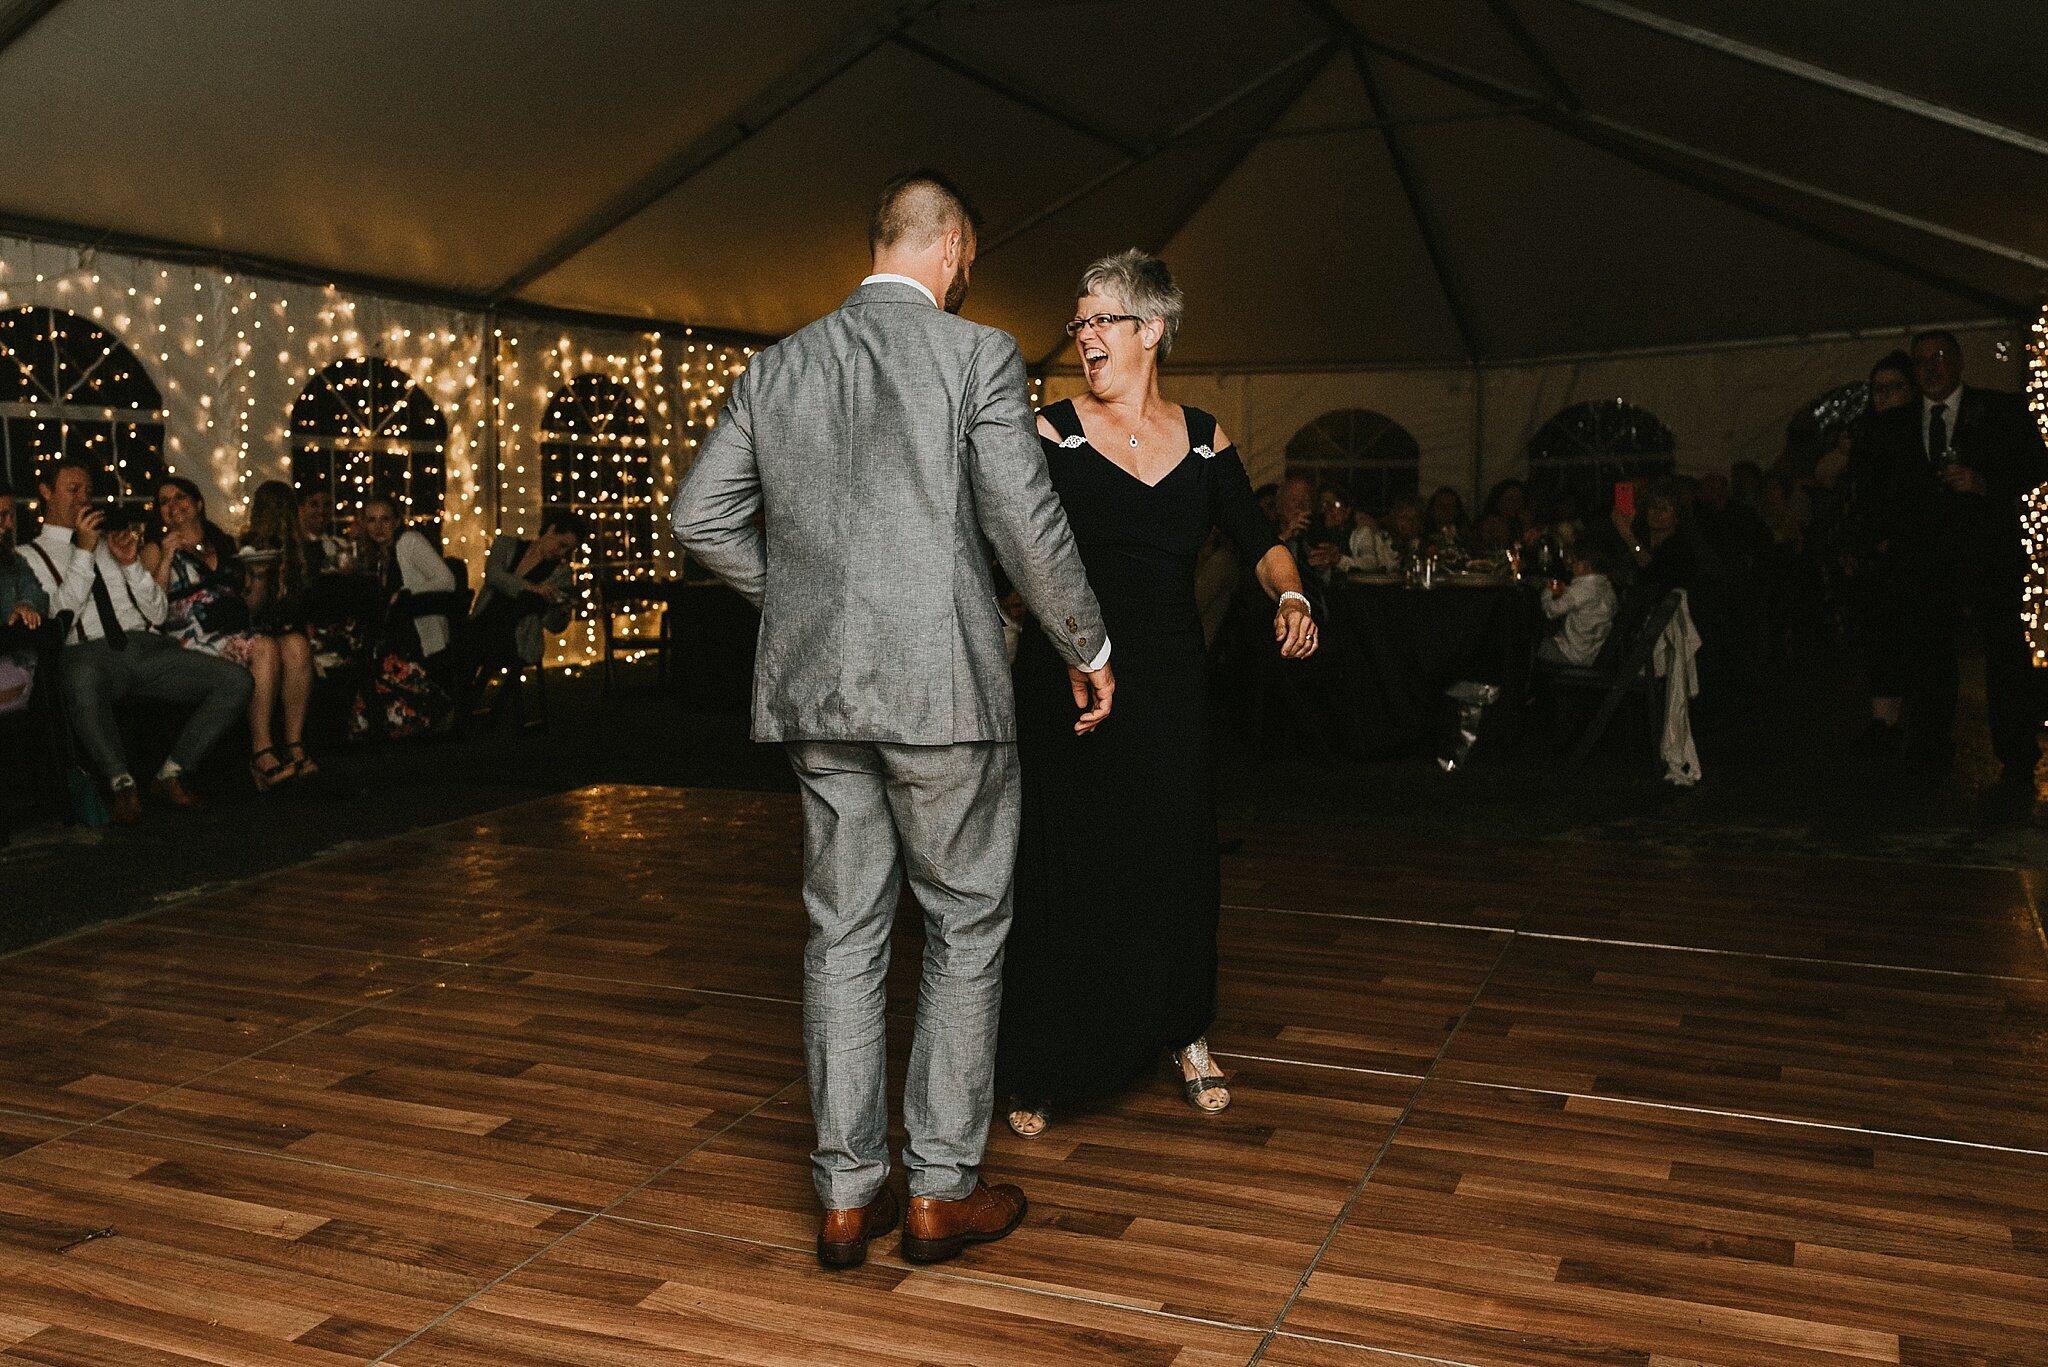 connecticut_wedding_3118.jpg